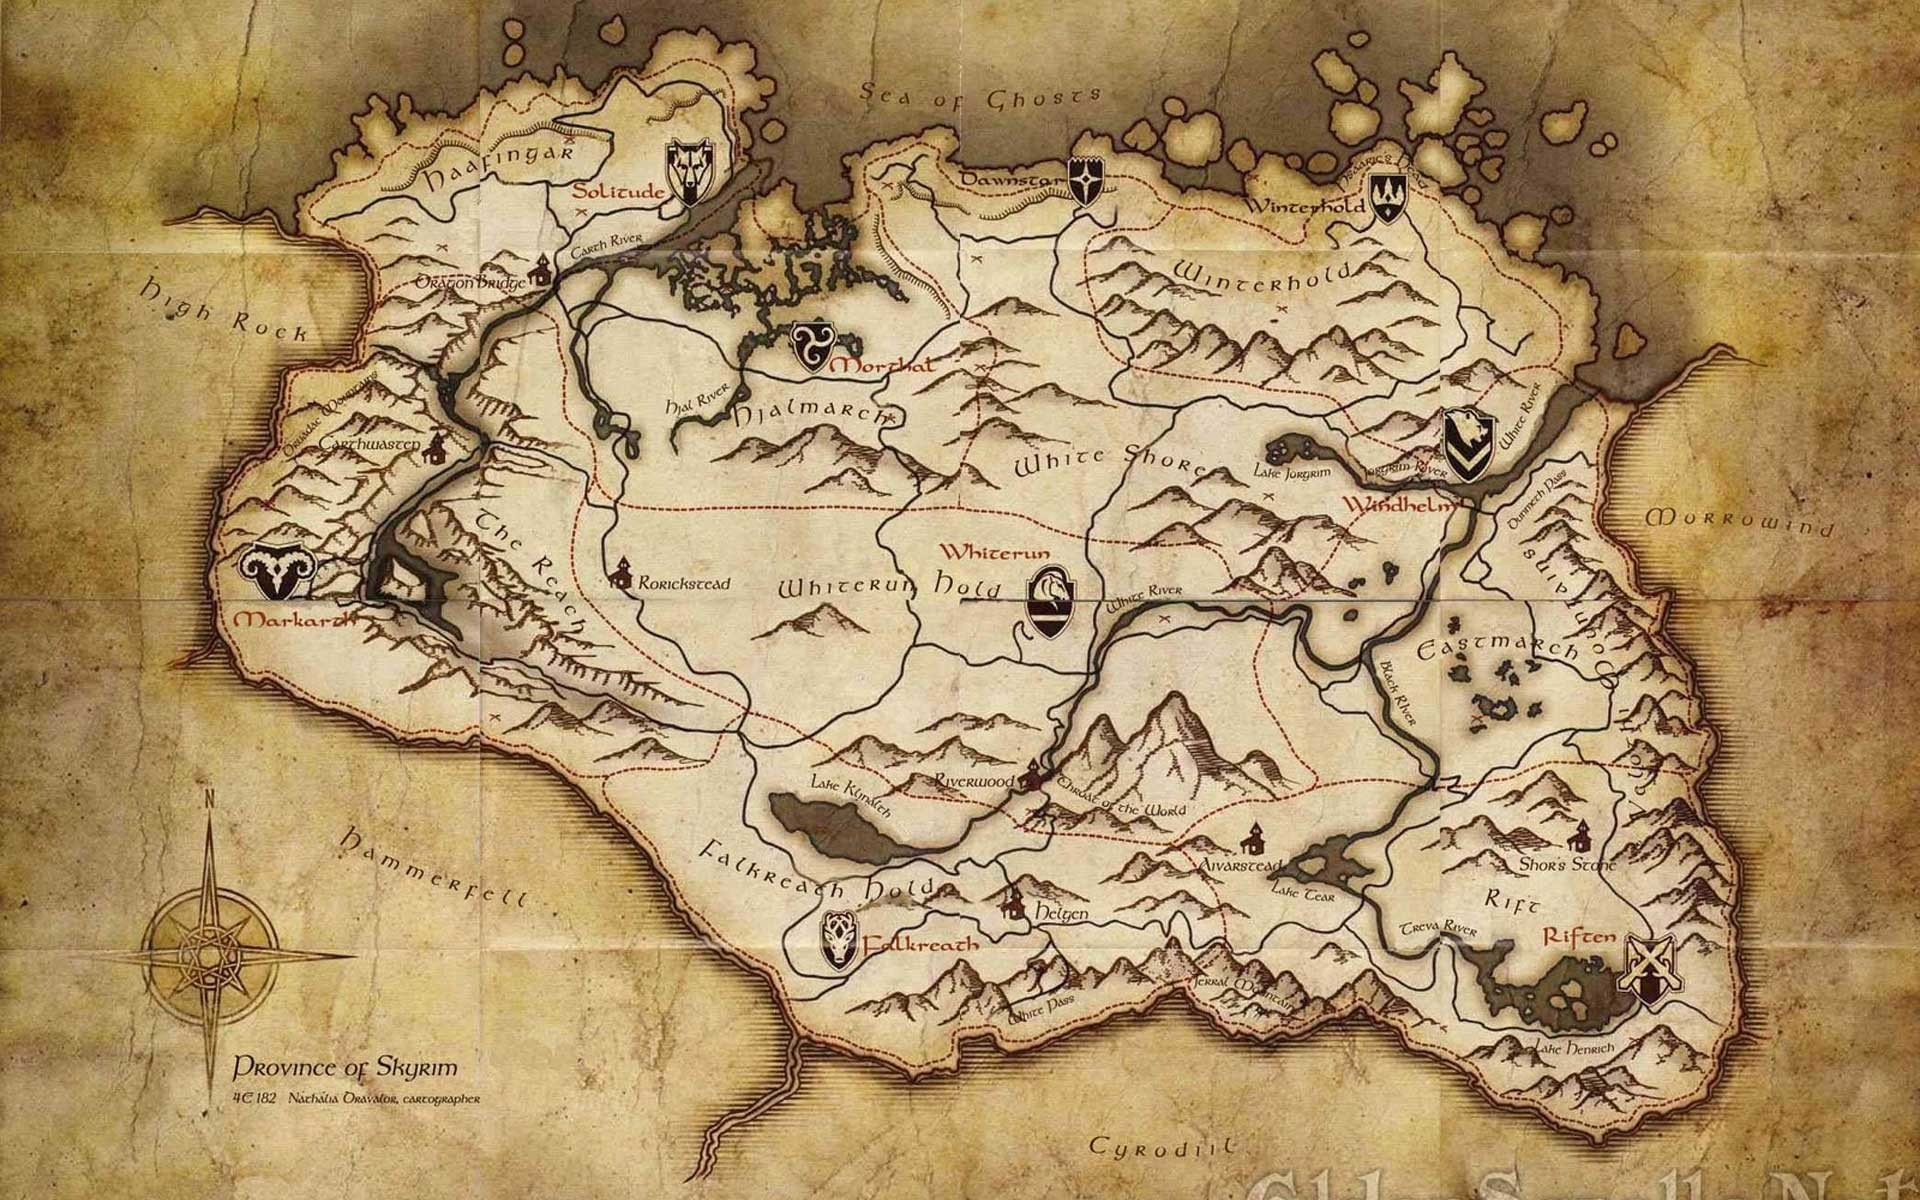 Wallpapers For > Skyrim Map Wallpaper 1920×1080